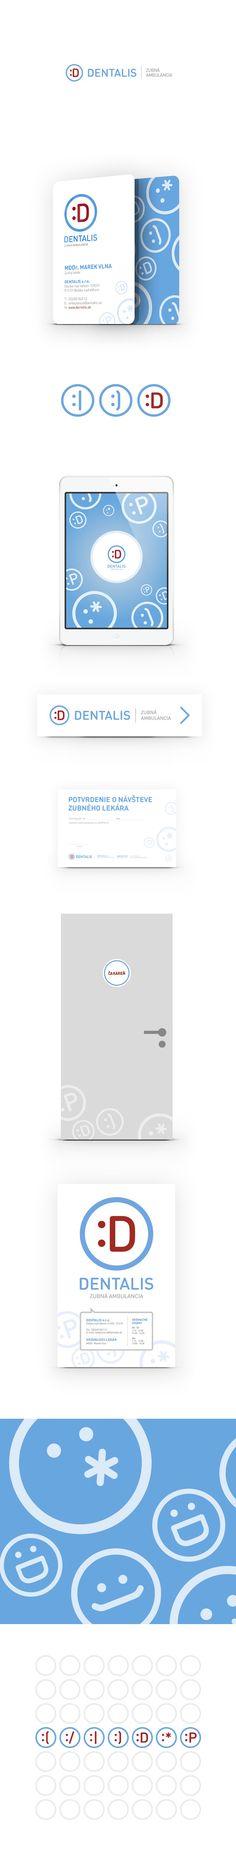 Dentalis // zubná ambulancia Identity, Map, Ambulance, Cards, Maps